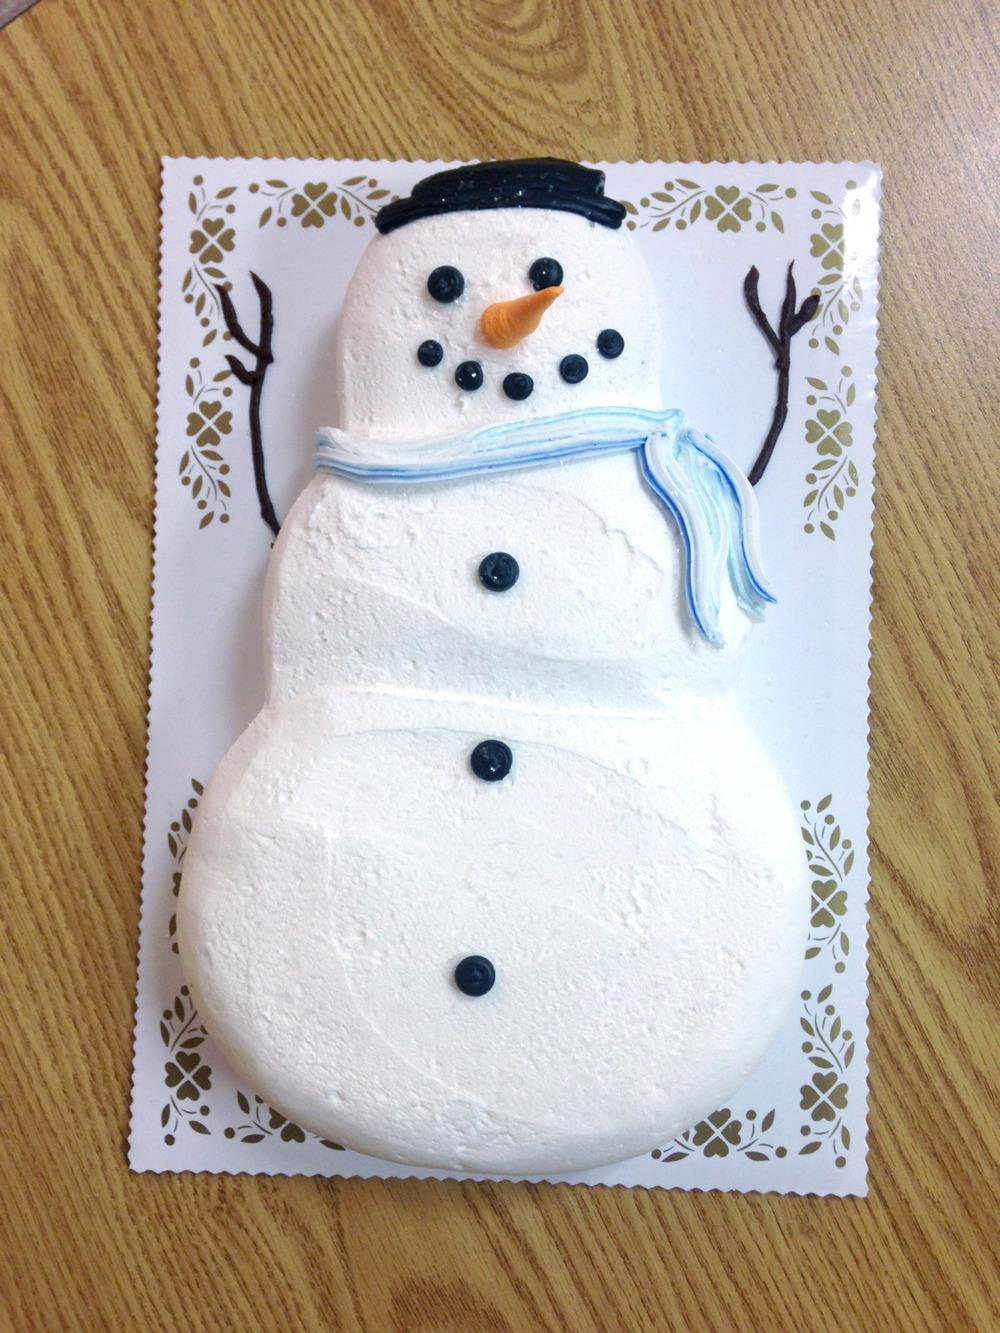 Snowman Shaped Cake